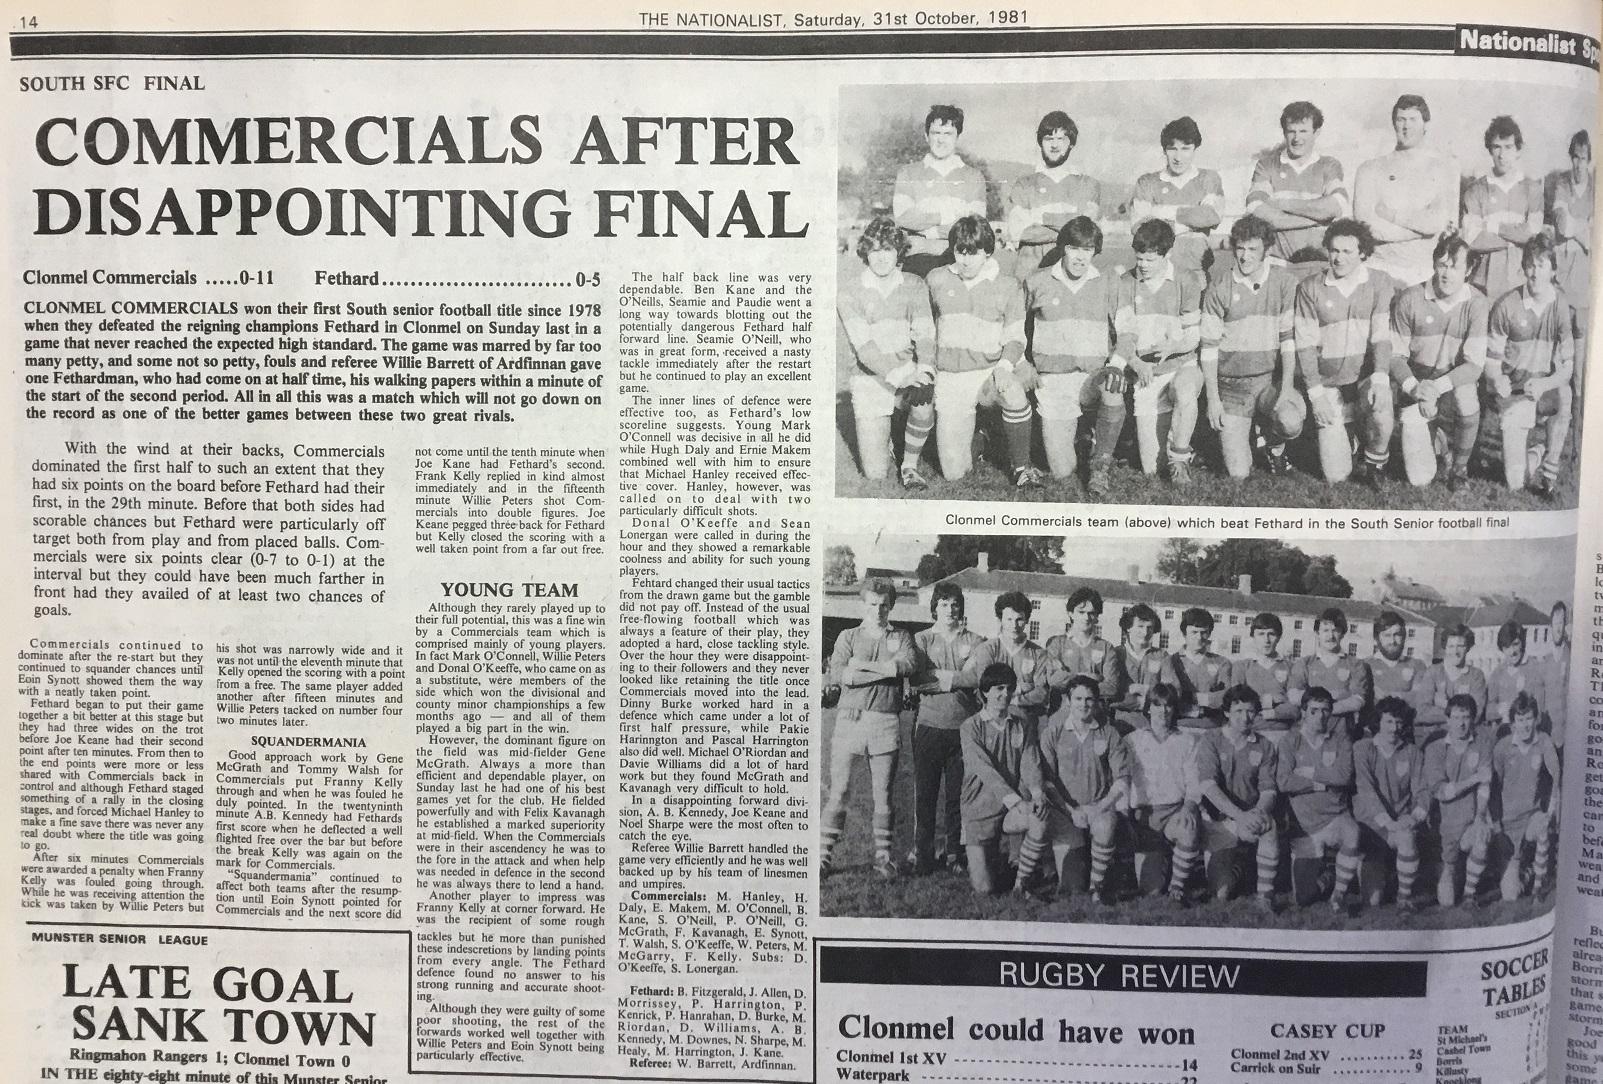 1981 South football final replay